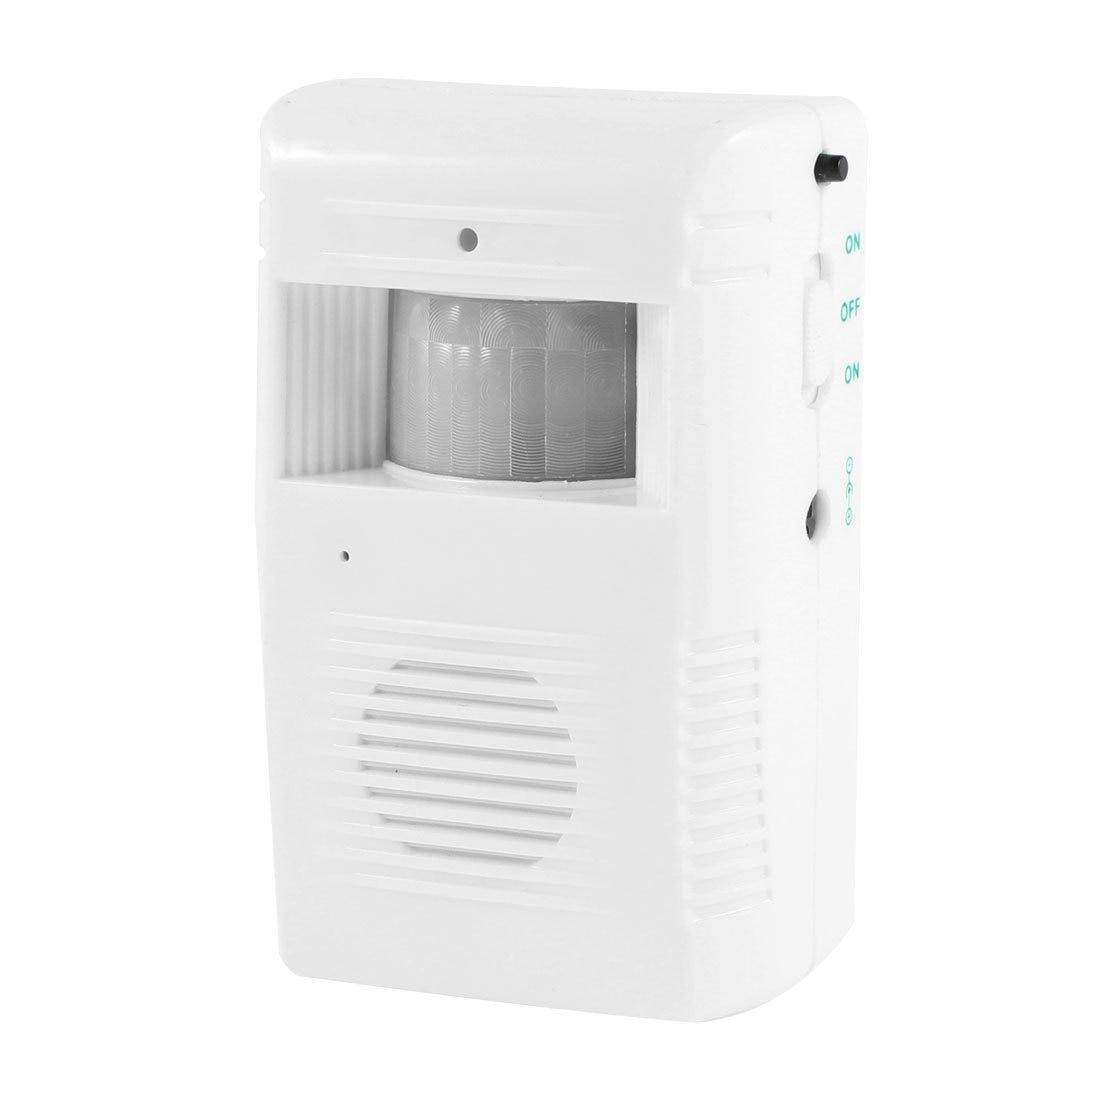 цена на MOOL Music Chime Voice Greeting Warning Infrared Motion Sensor Welcome Doorbell White